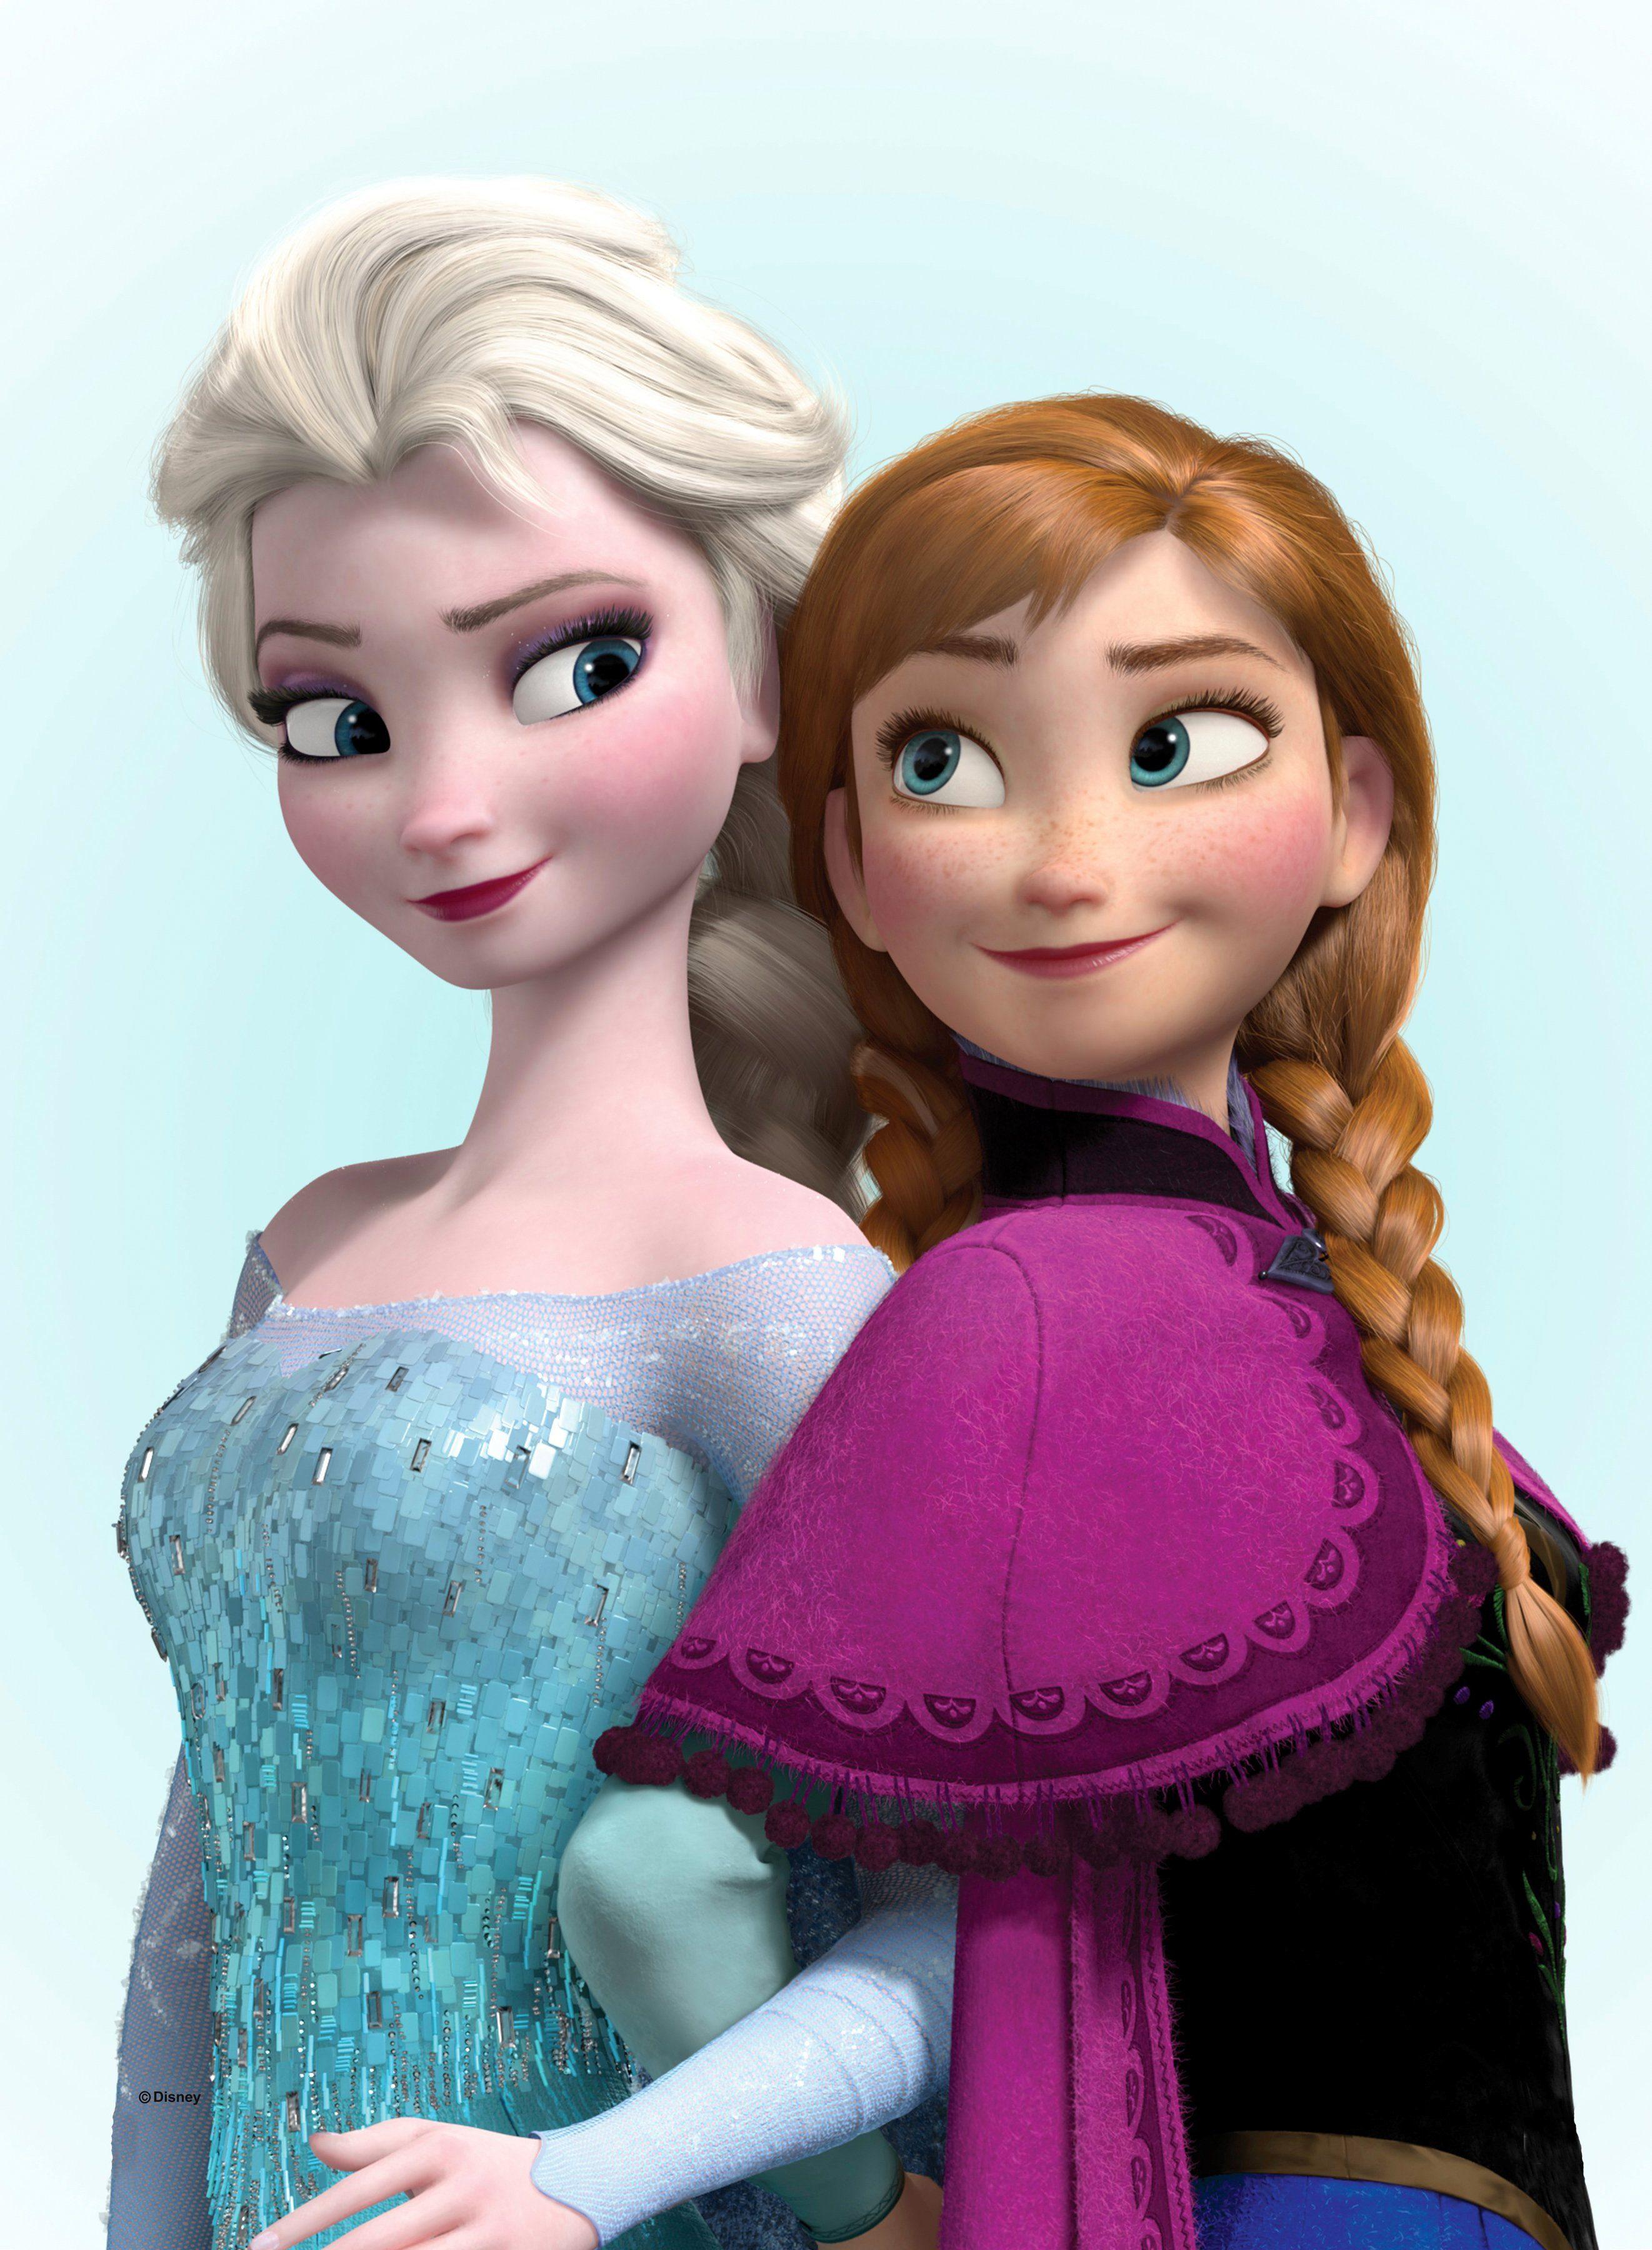 Graham & Brown Leinwandbild »Eiskönigin - Elsa und Anna«